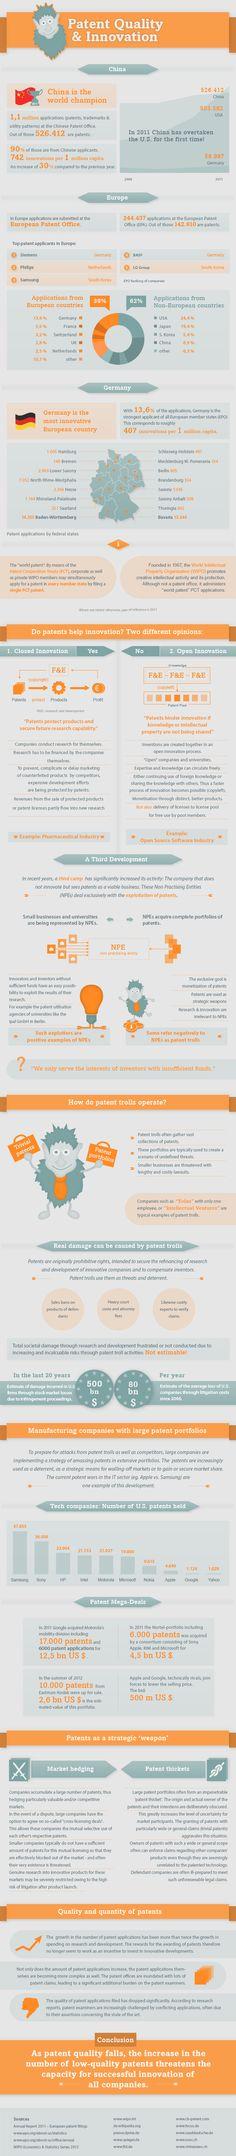 Patent quantity and quality  http://www.bluepatent.com/en/blog/quality-quantity-patents